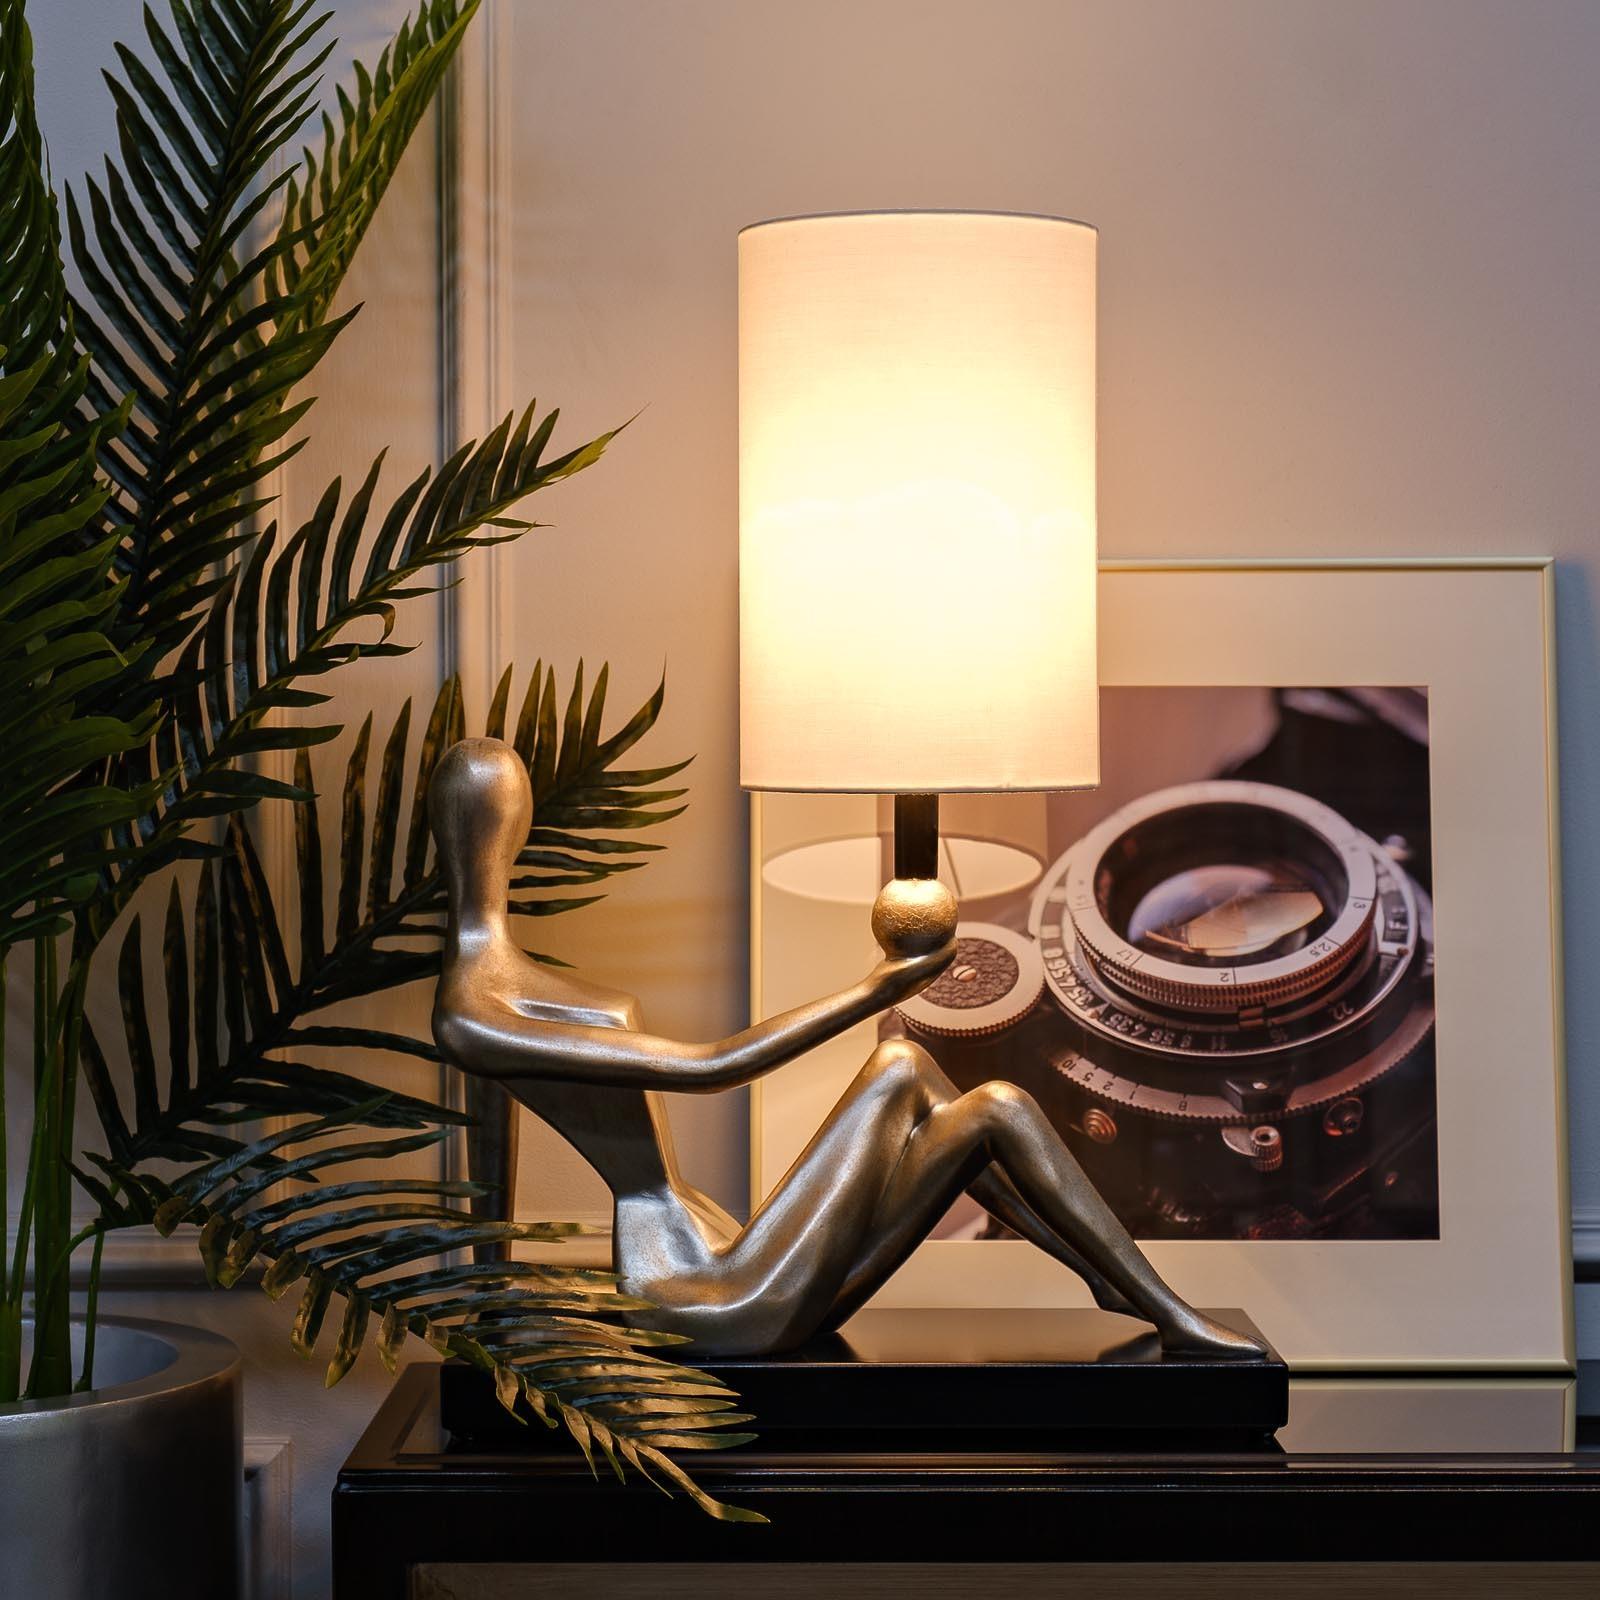 ART-4441-LM1 Лампа настольная плафон бежевый 46*25*66см, 220В